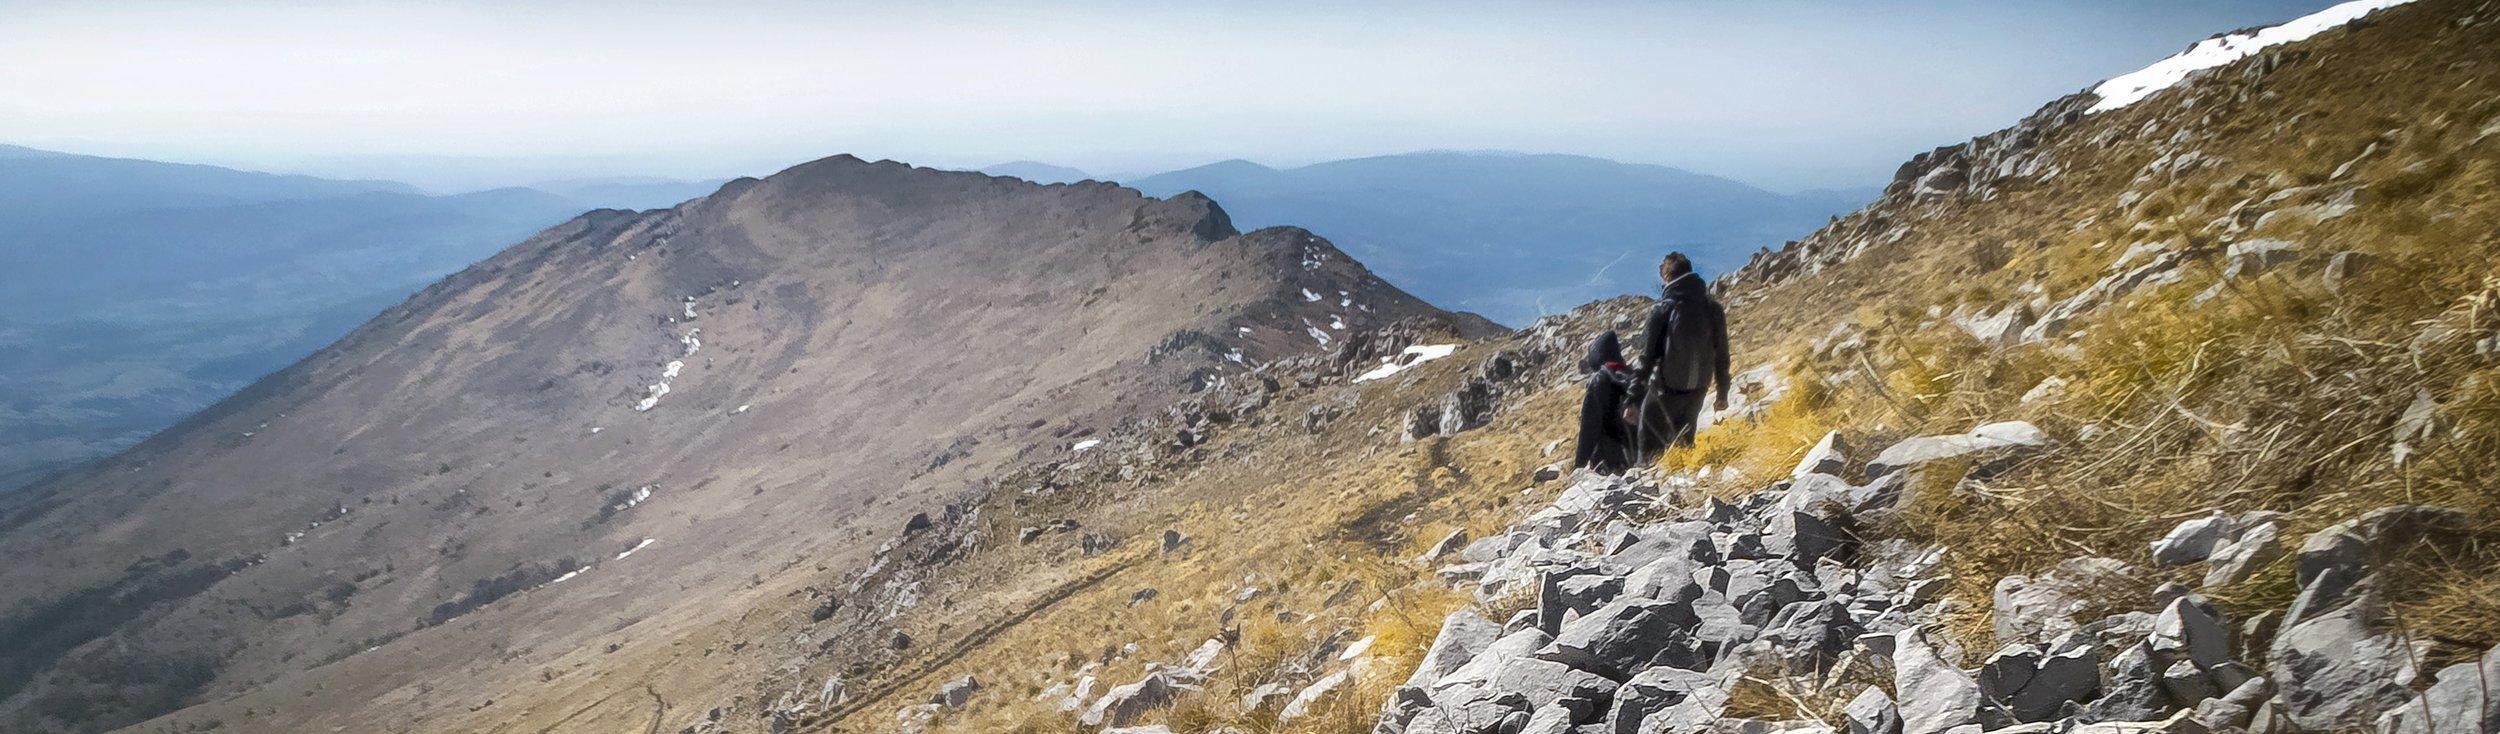 Serbia top hiking destinations